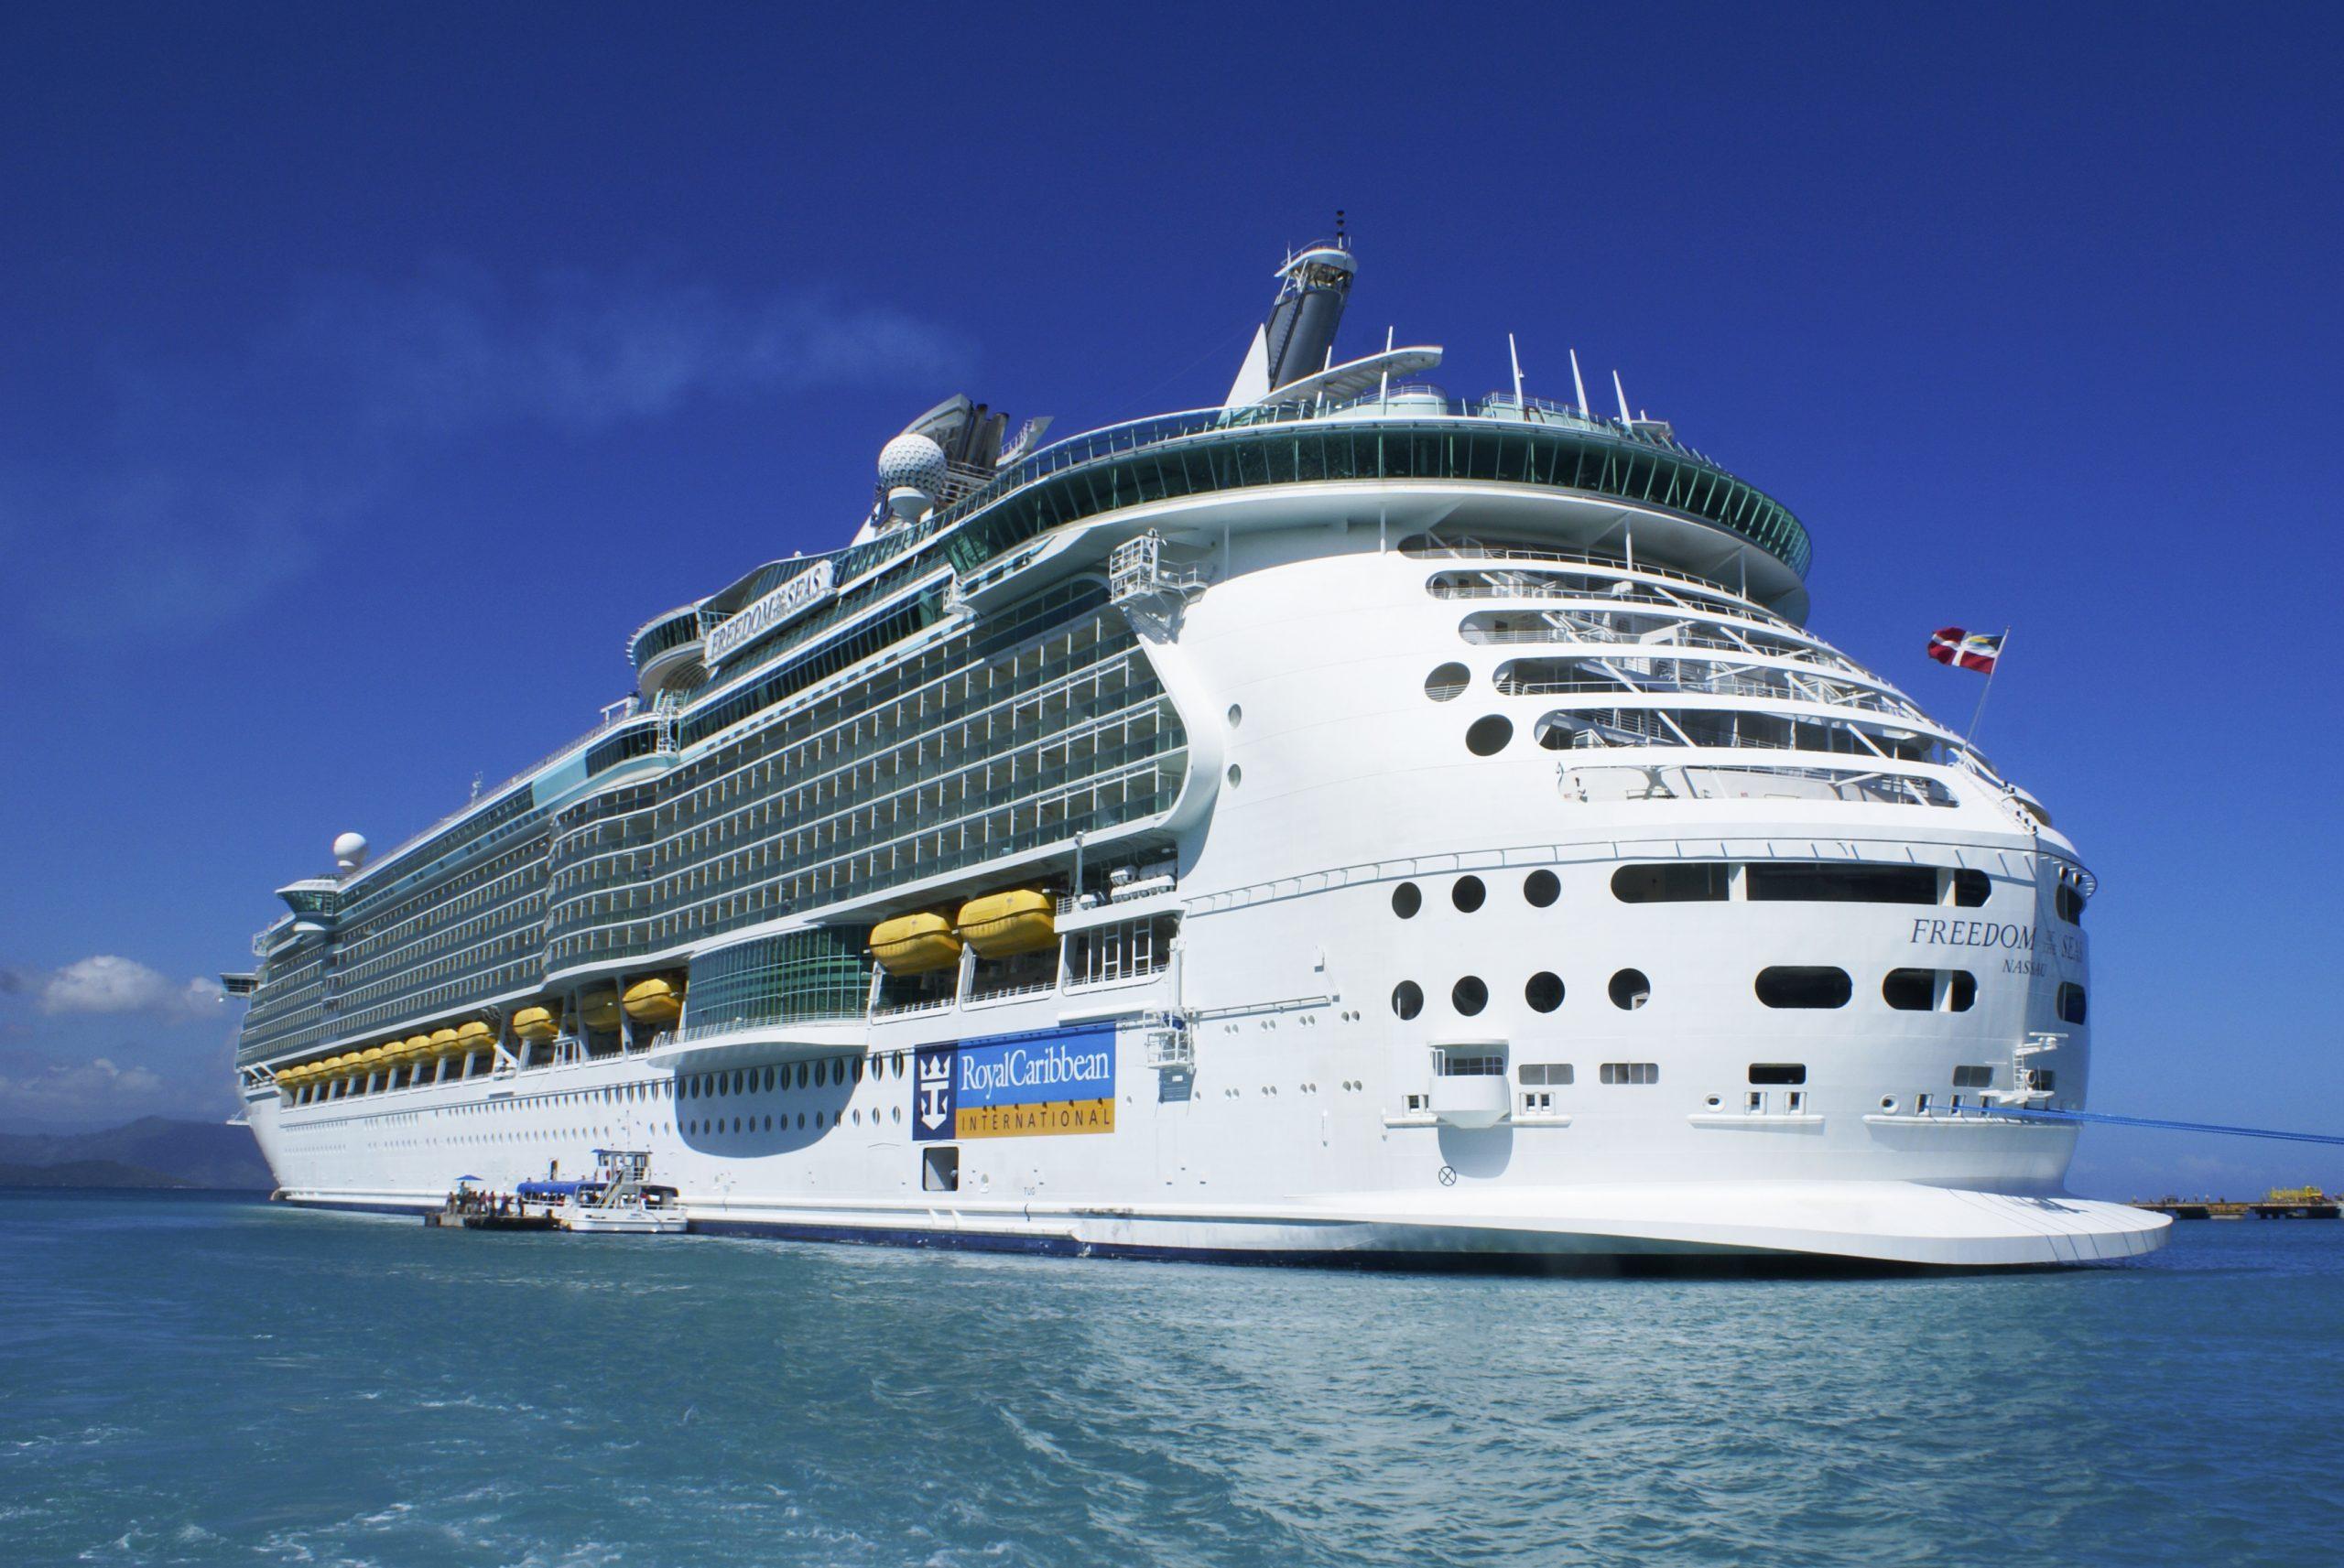 Royal Caribbean Cruises, Freedom of the seas cruise ship anchored in Labadee.